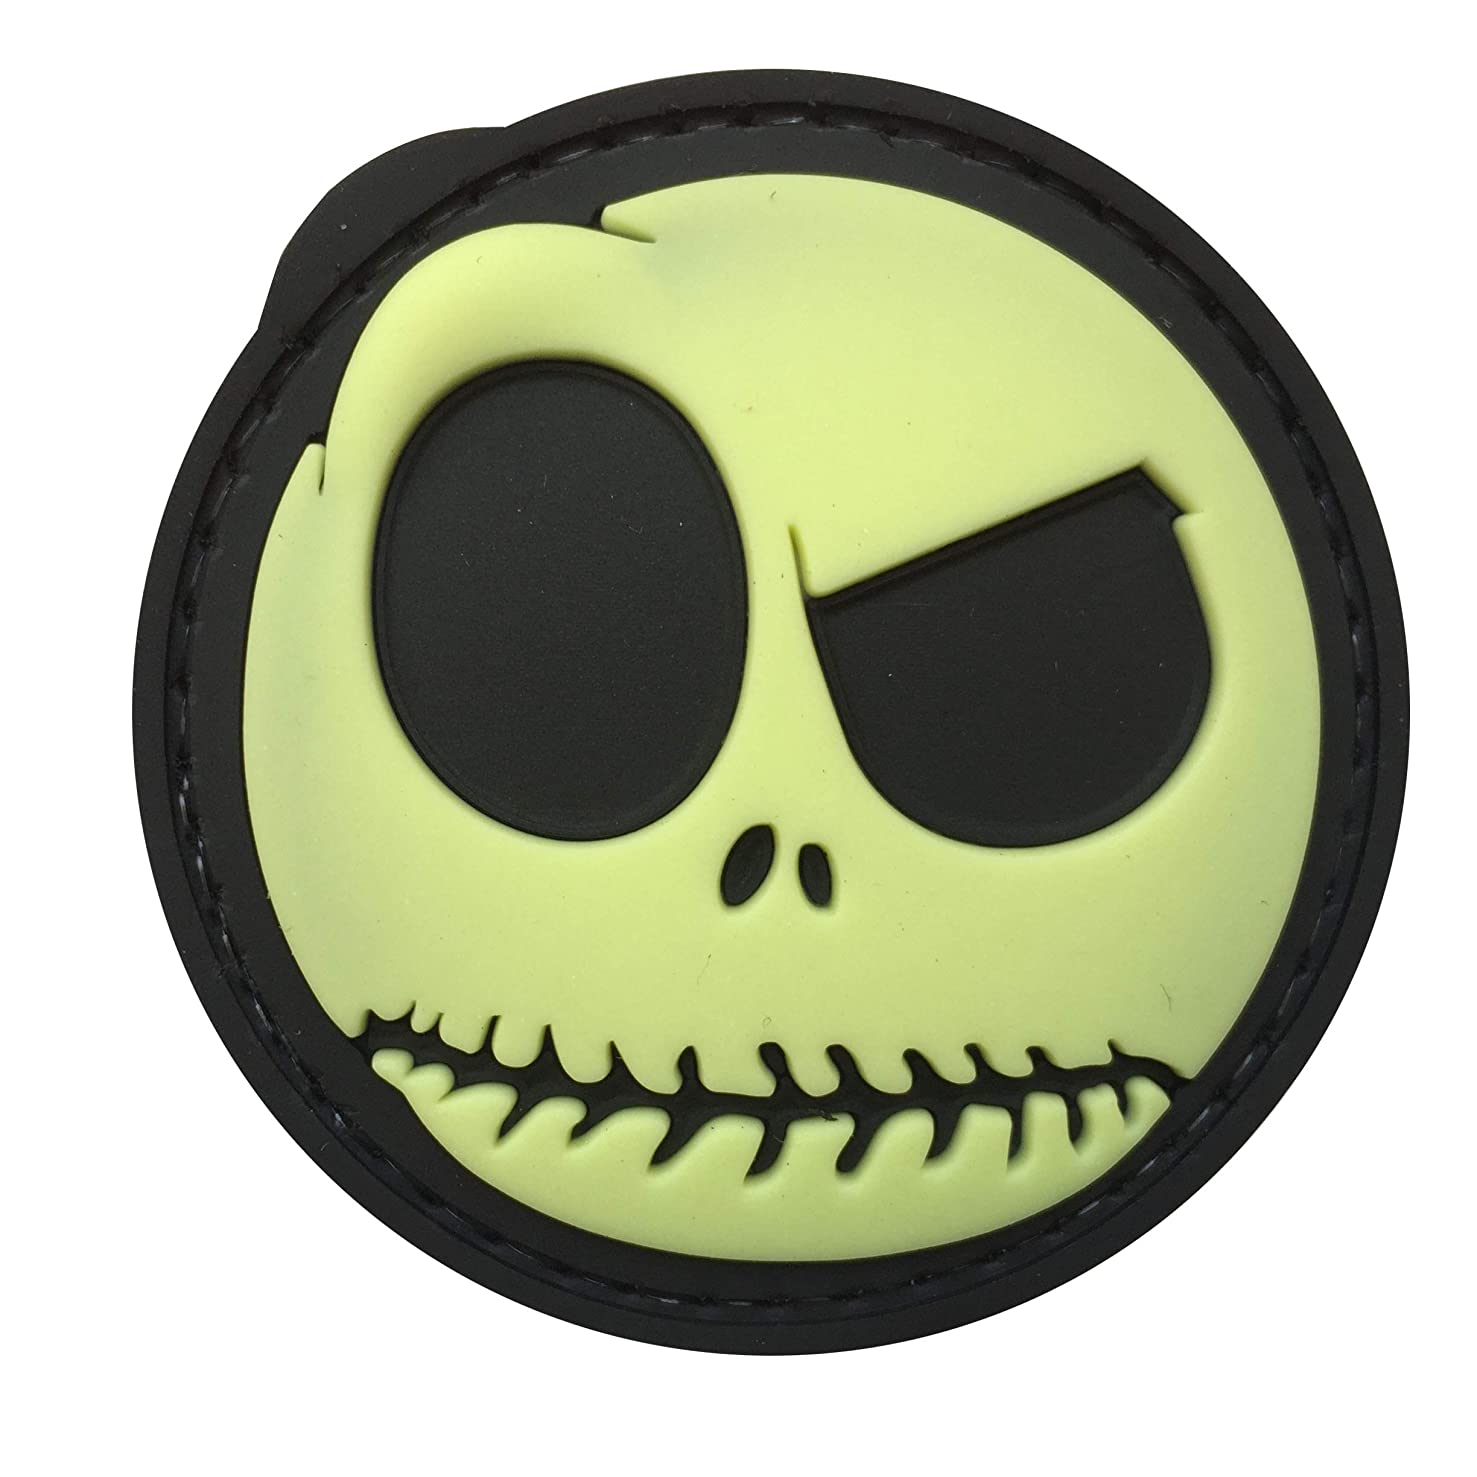 Nightmare Smiley Funny Skull Glow in The Dark GITD 3D PVC Rubber Patch by uuKen Tactical Gear